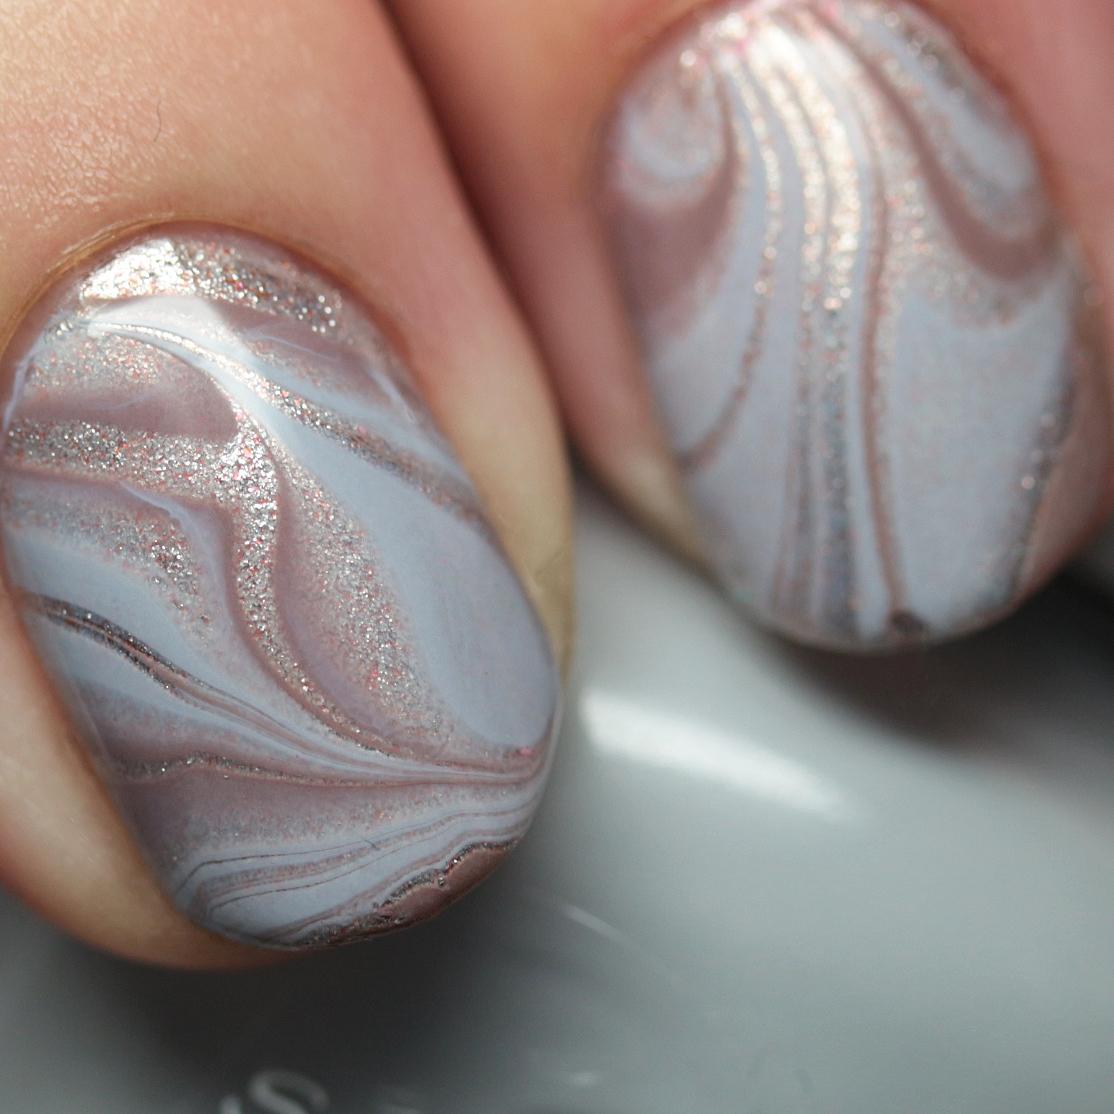 The polished hippy sally hansen complete salon manicure for Salon manicure